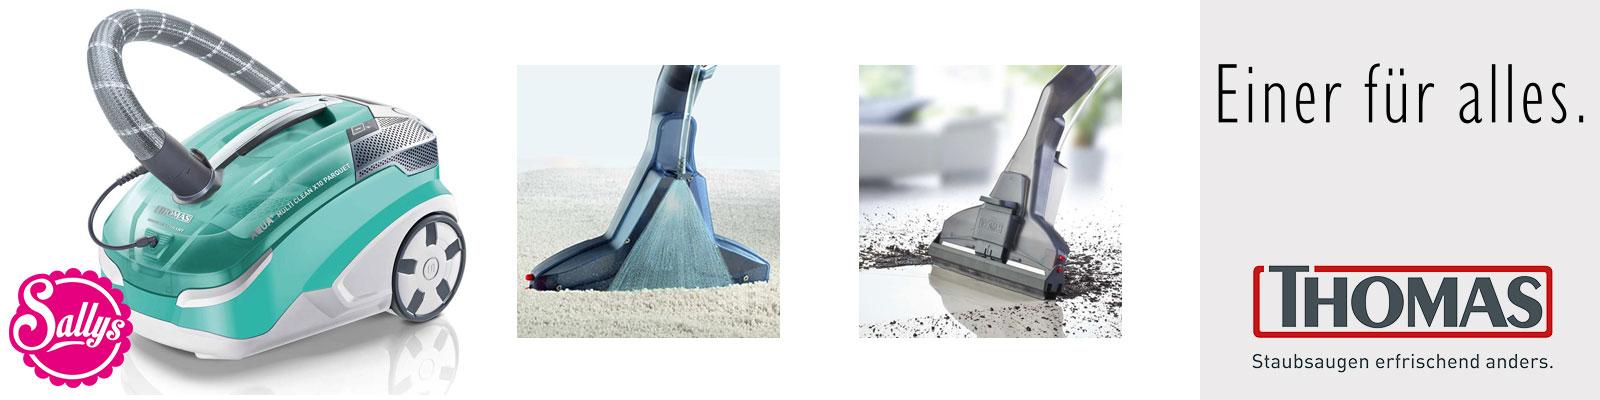 Relativ Staubsauger Aqua+ Multi Clean | Ramershoven.com AR72